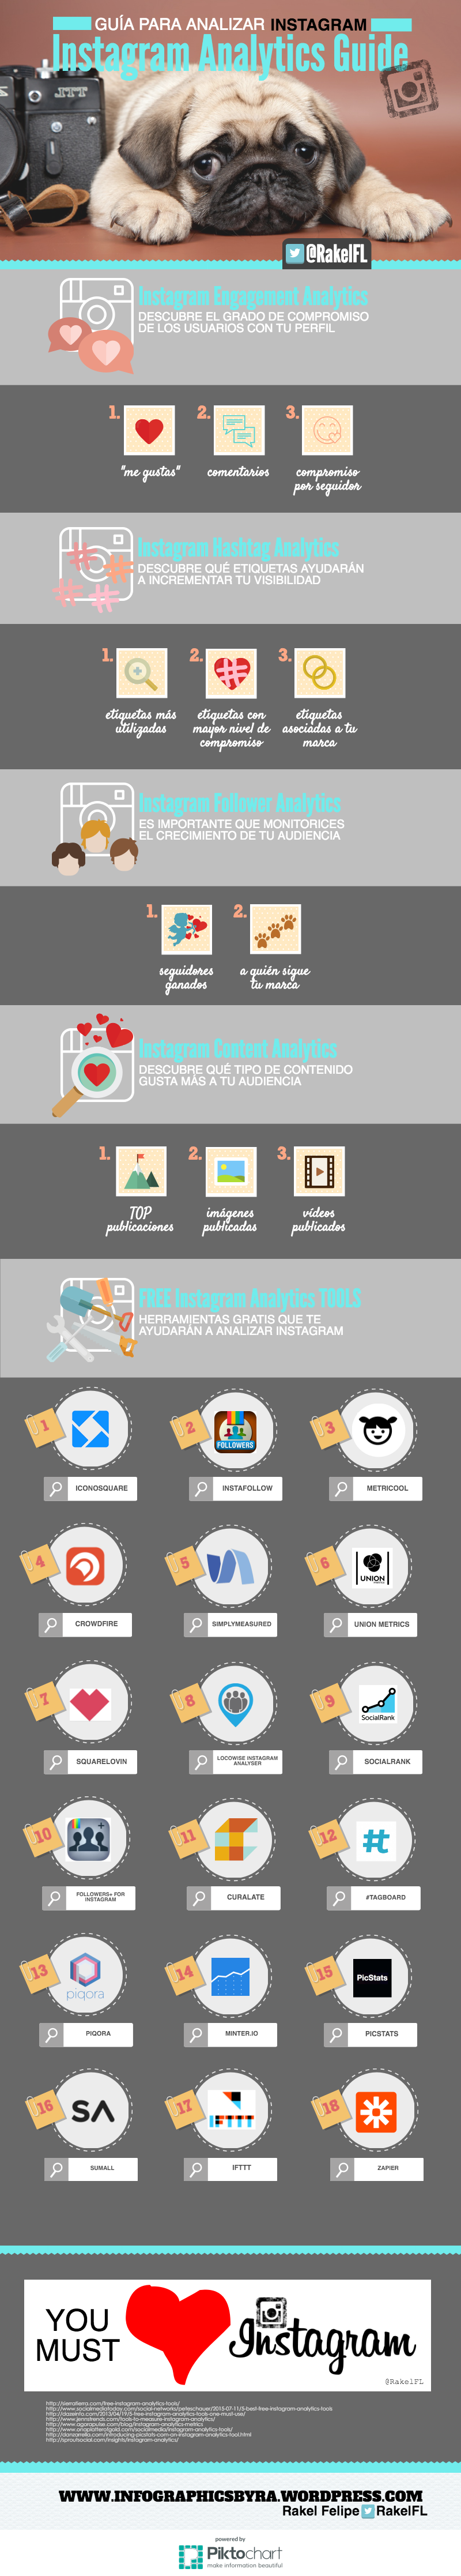 Guía para analizar Instagram #infografia #infographic #socialmedia